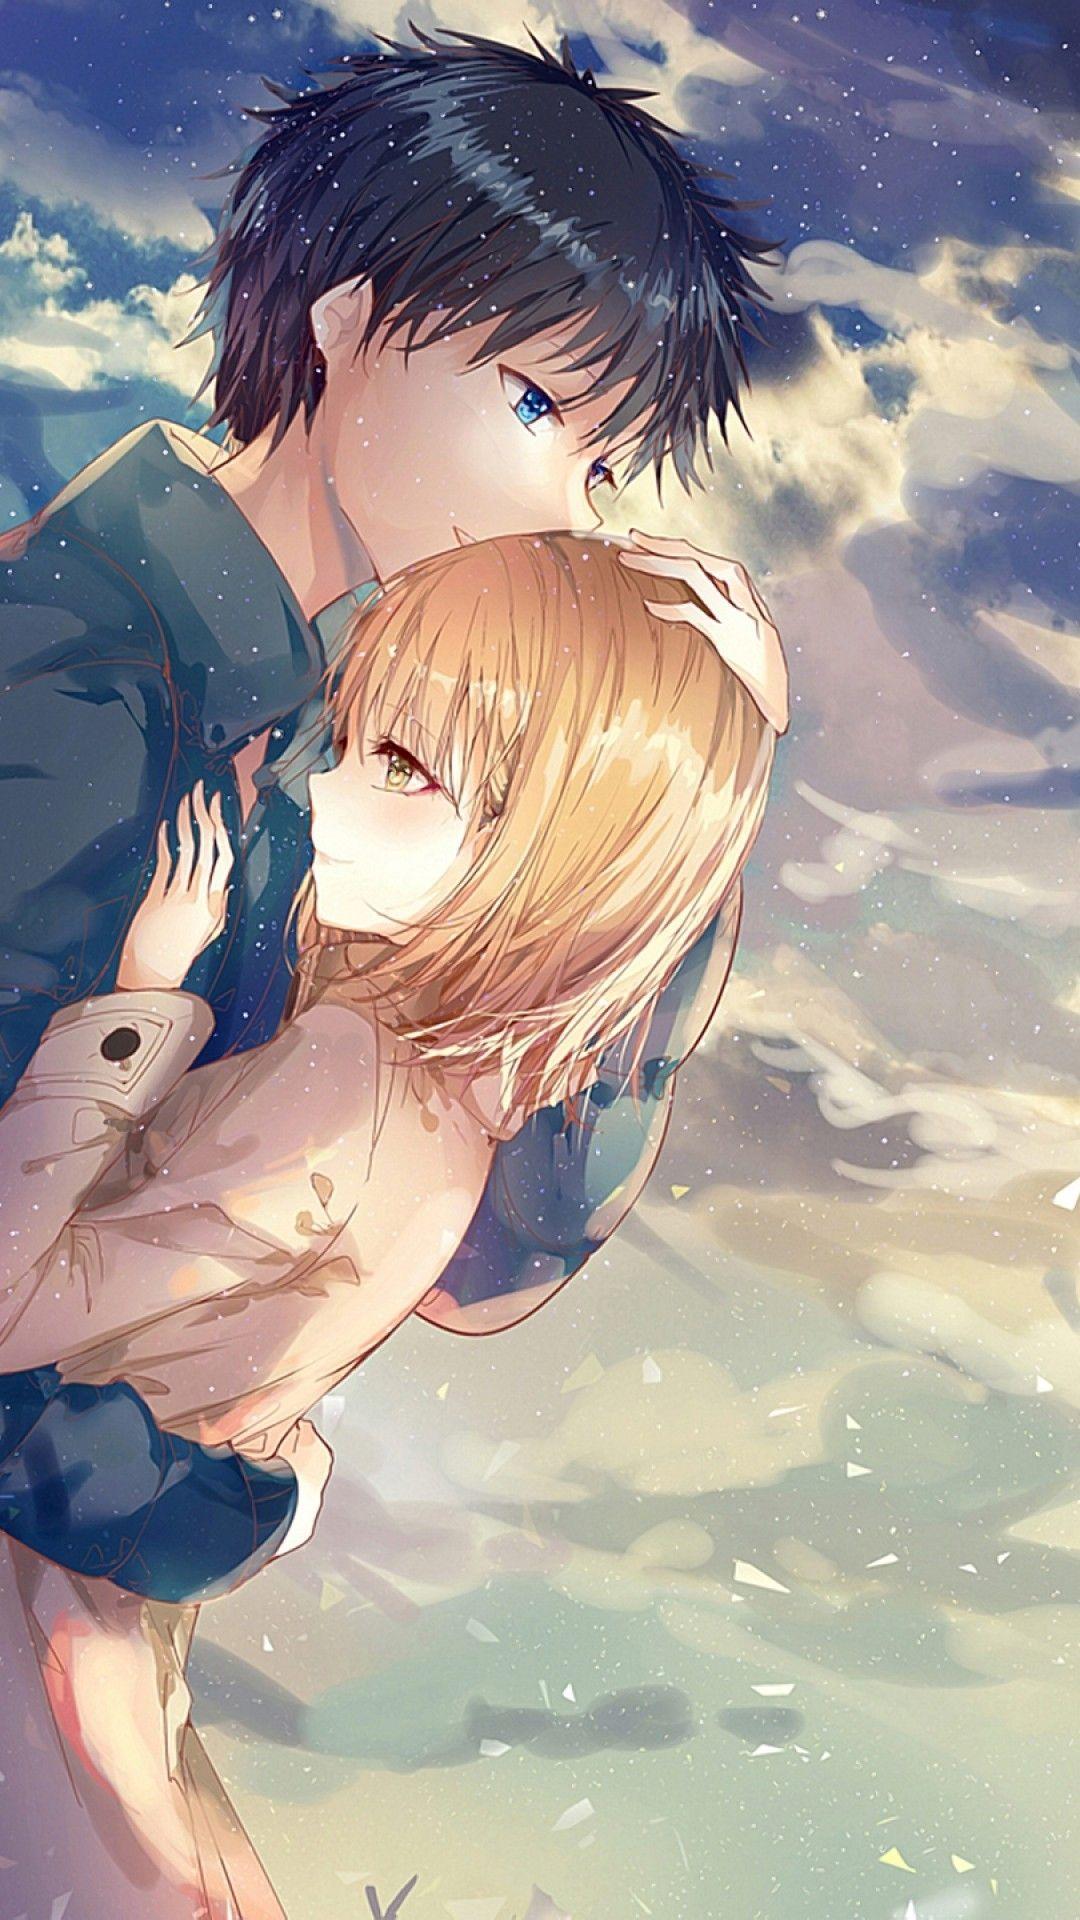 Download wallpaper anime couple hd